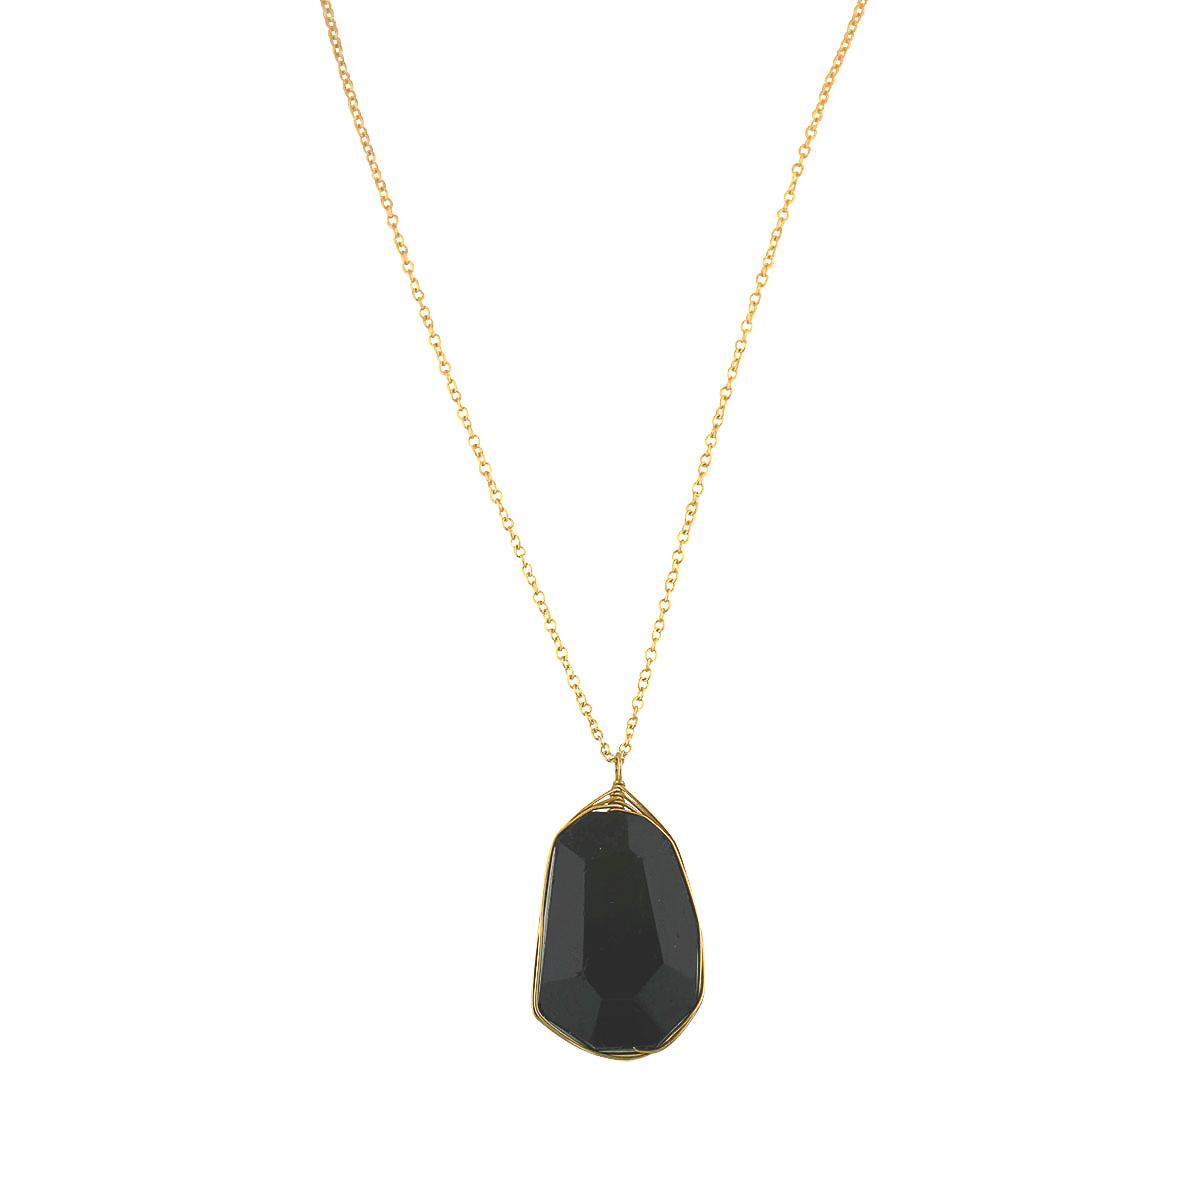 Bohemia Black Tourmaline Drop Necklace